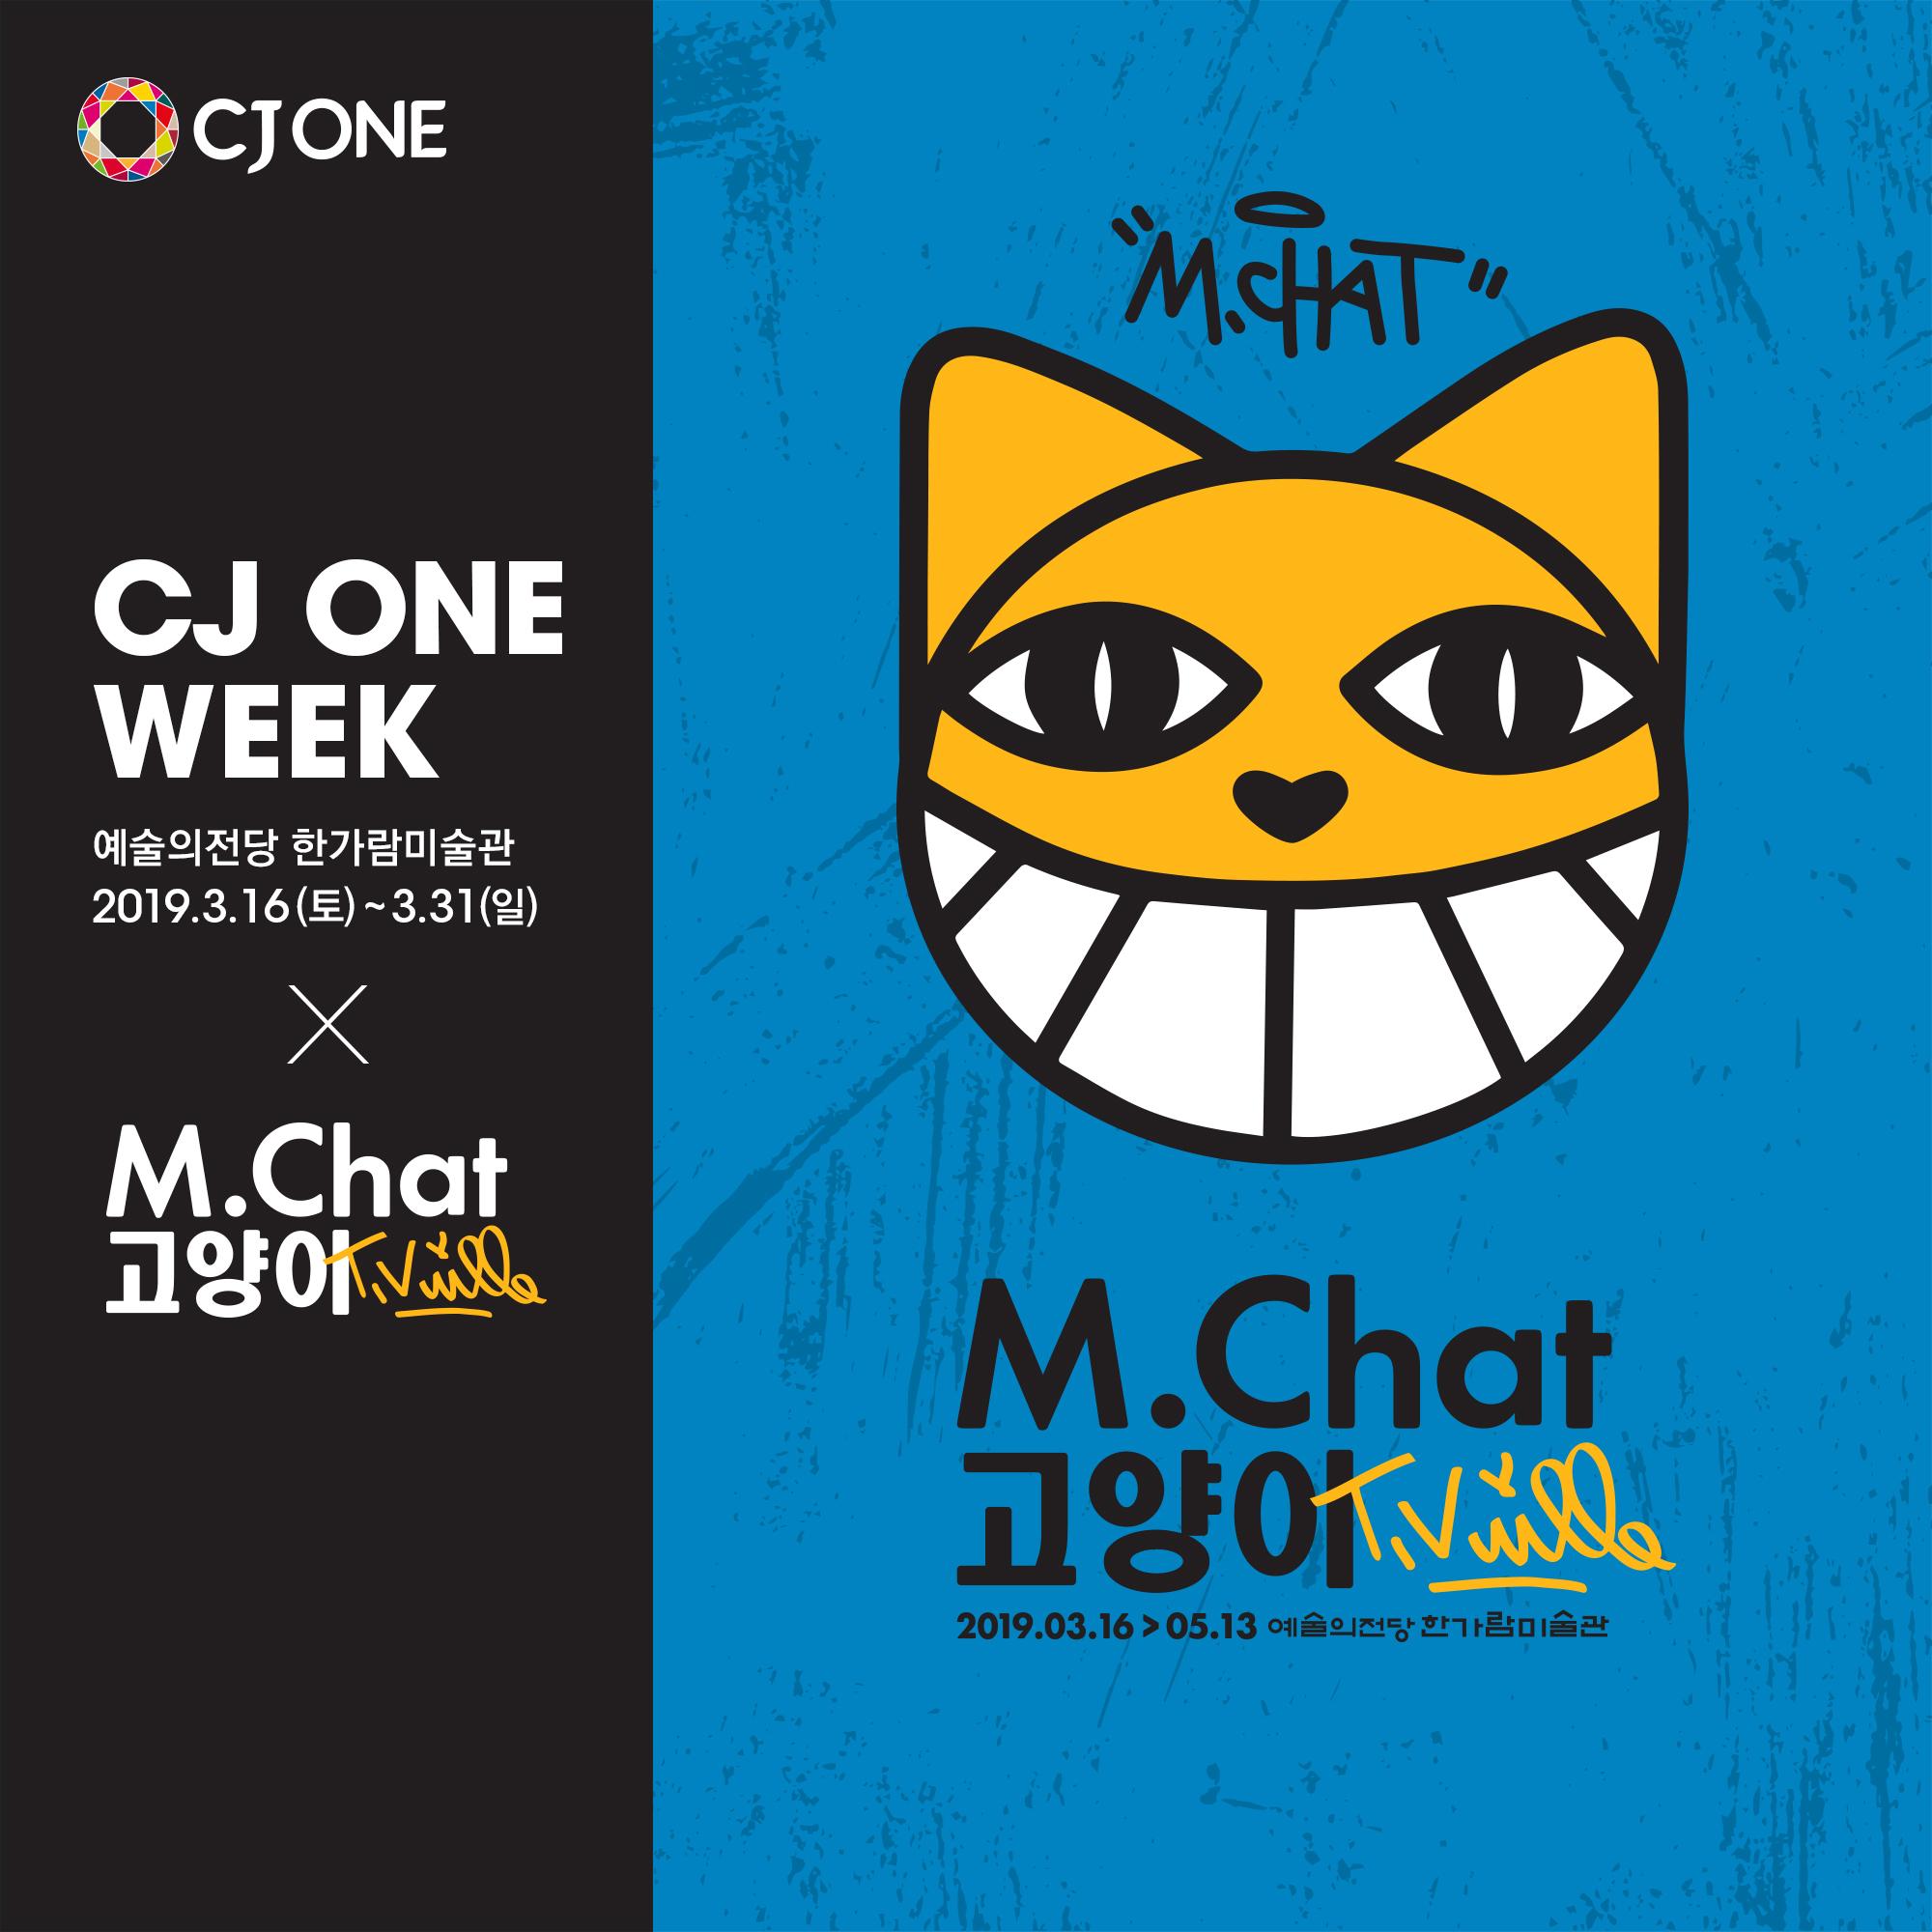 CJ ONE, 'M.Chat 고양이'전 프로모션